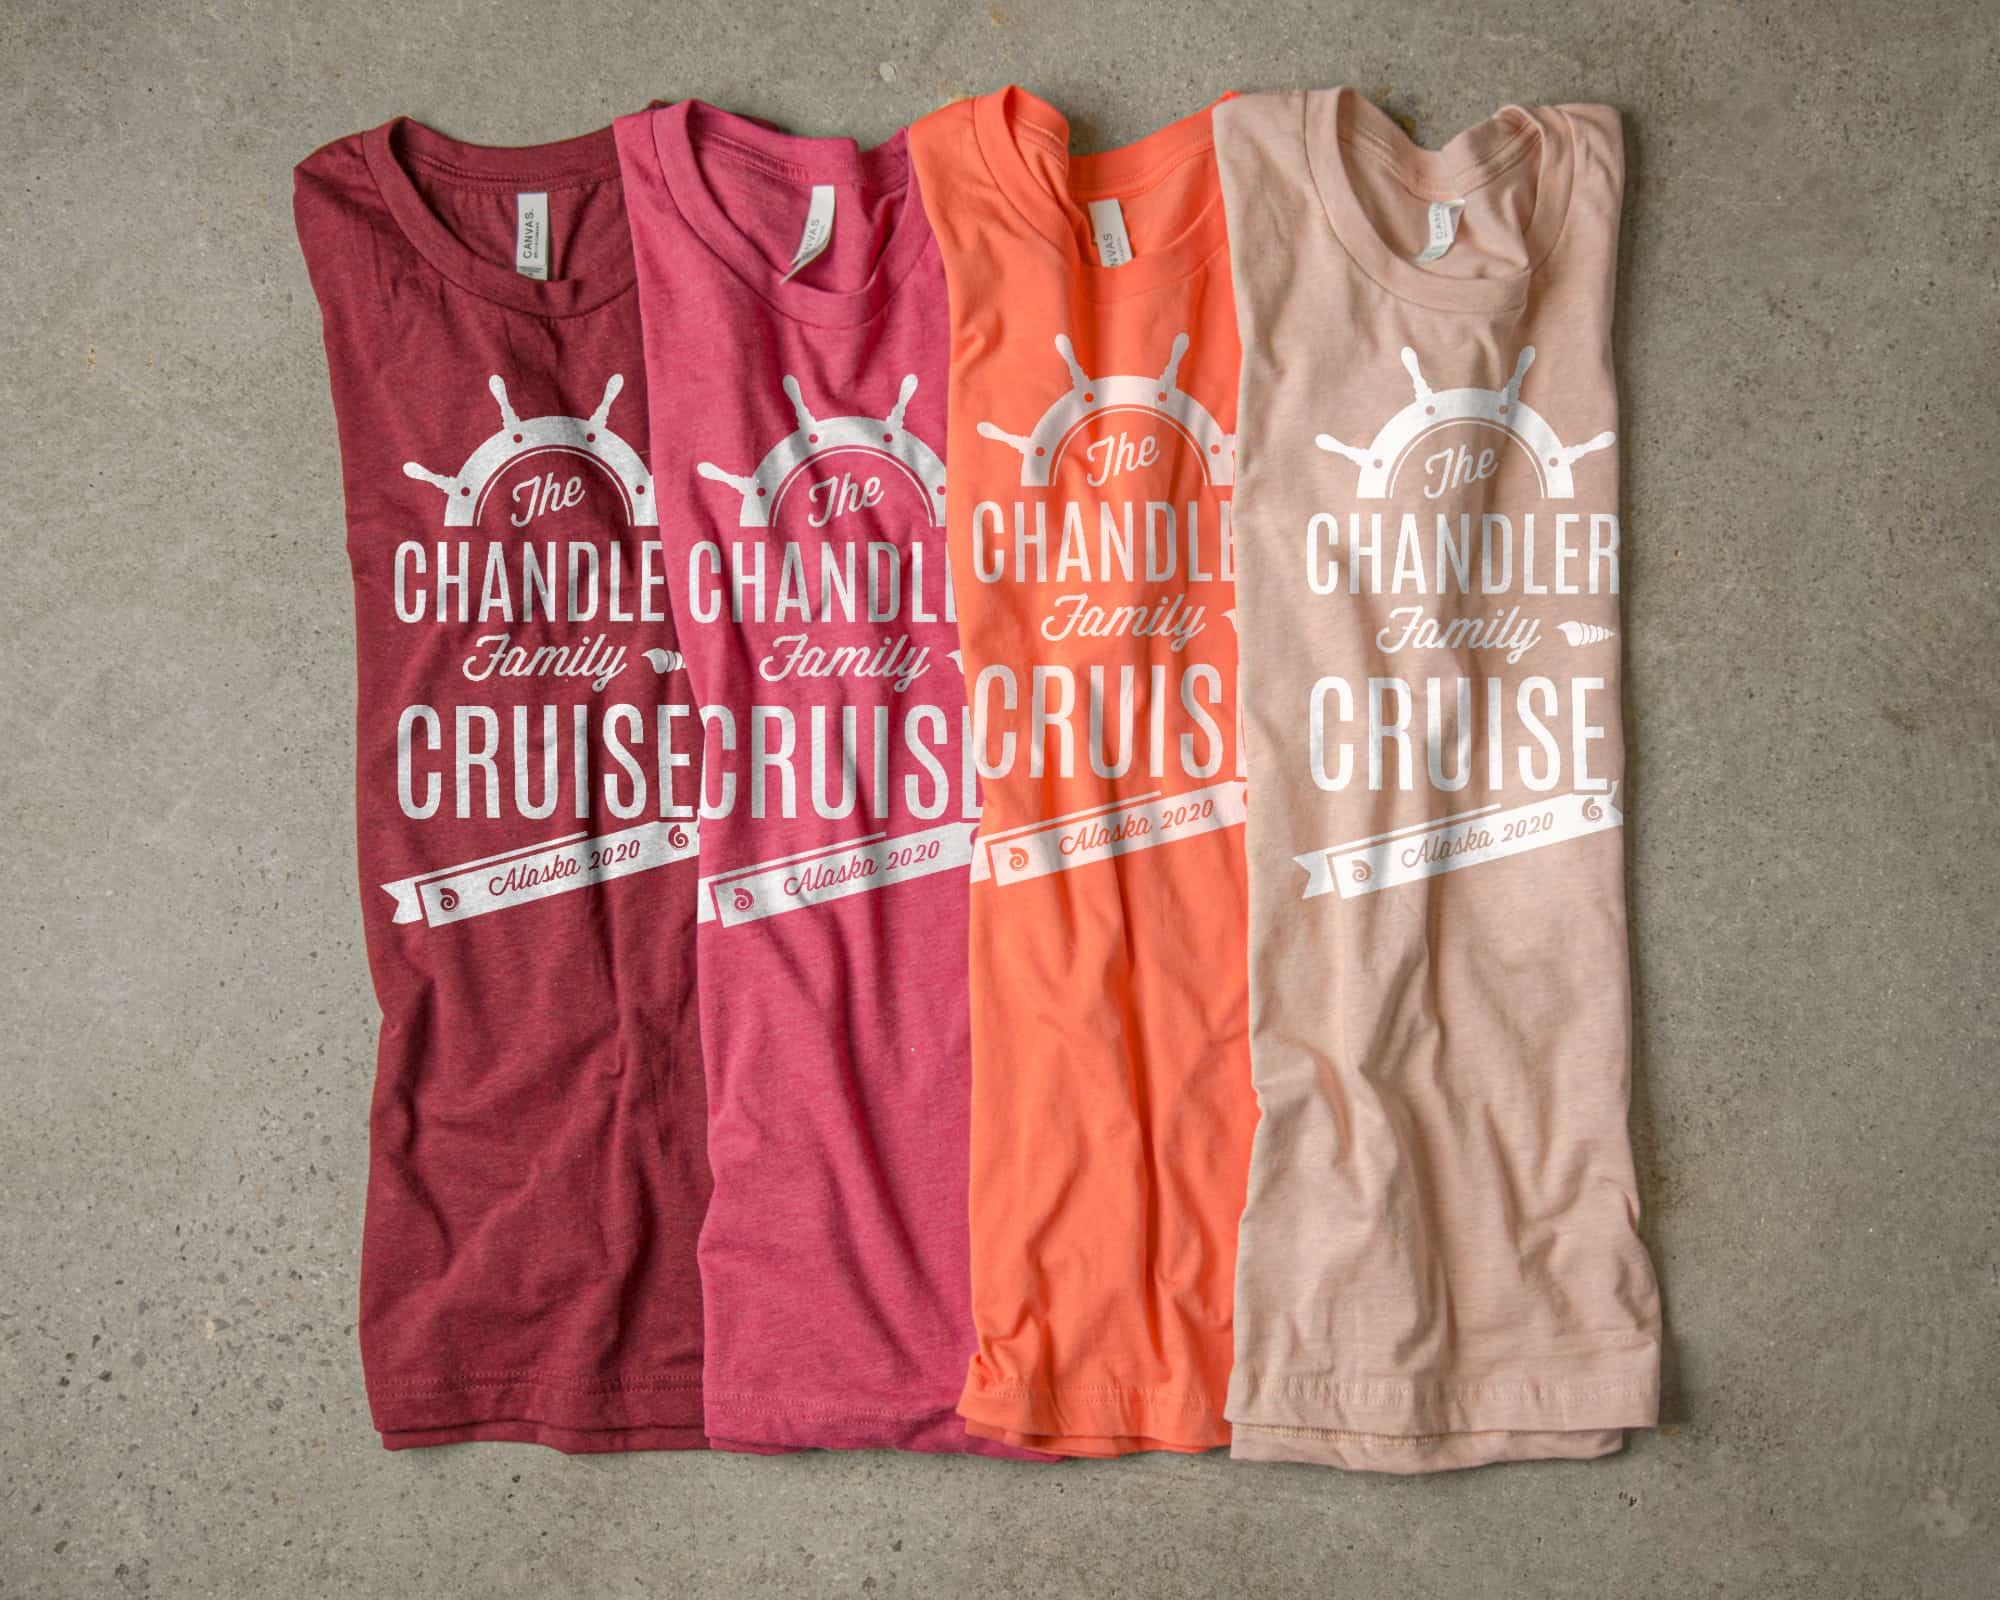 An analogous color scheme made with an arrangement of t-shirts.